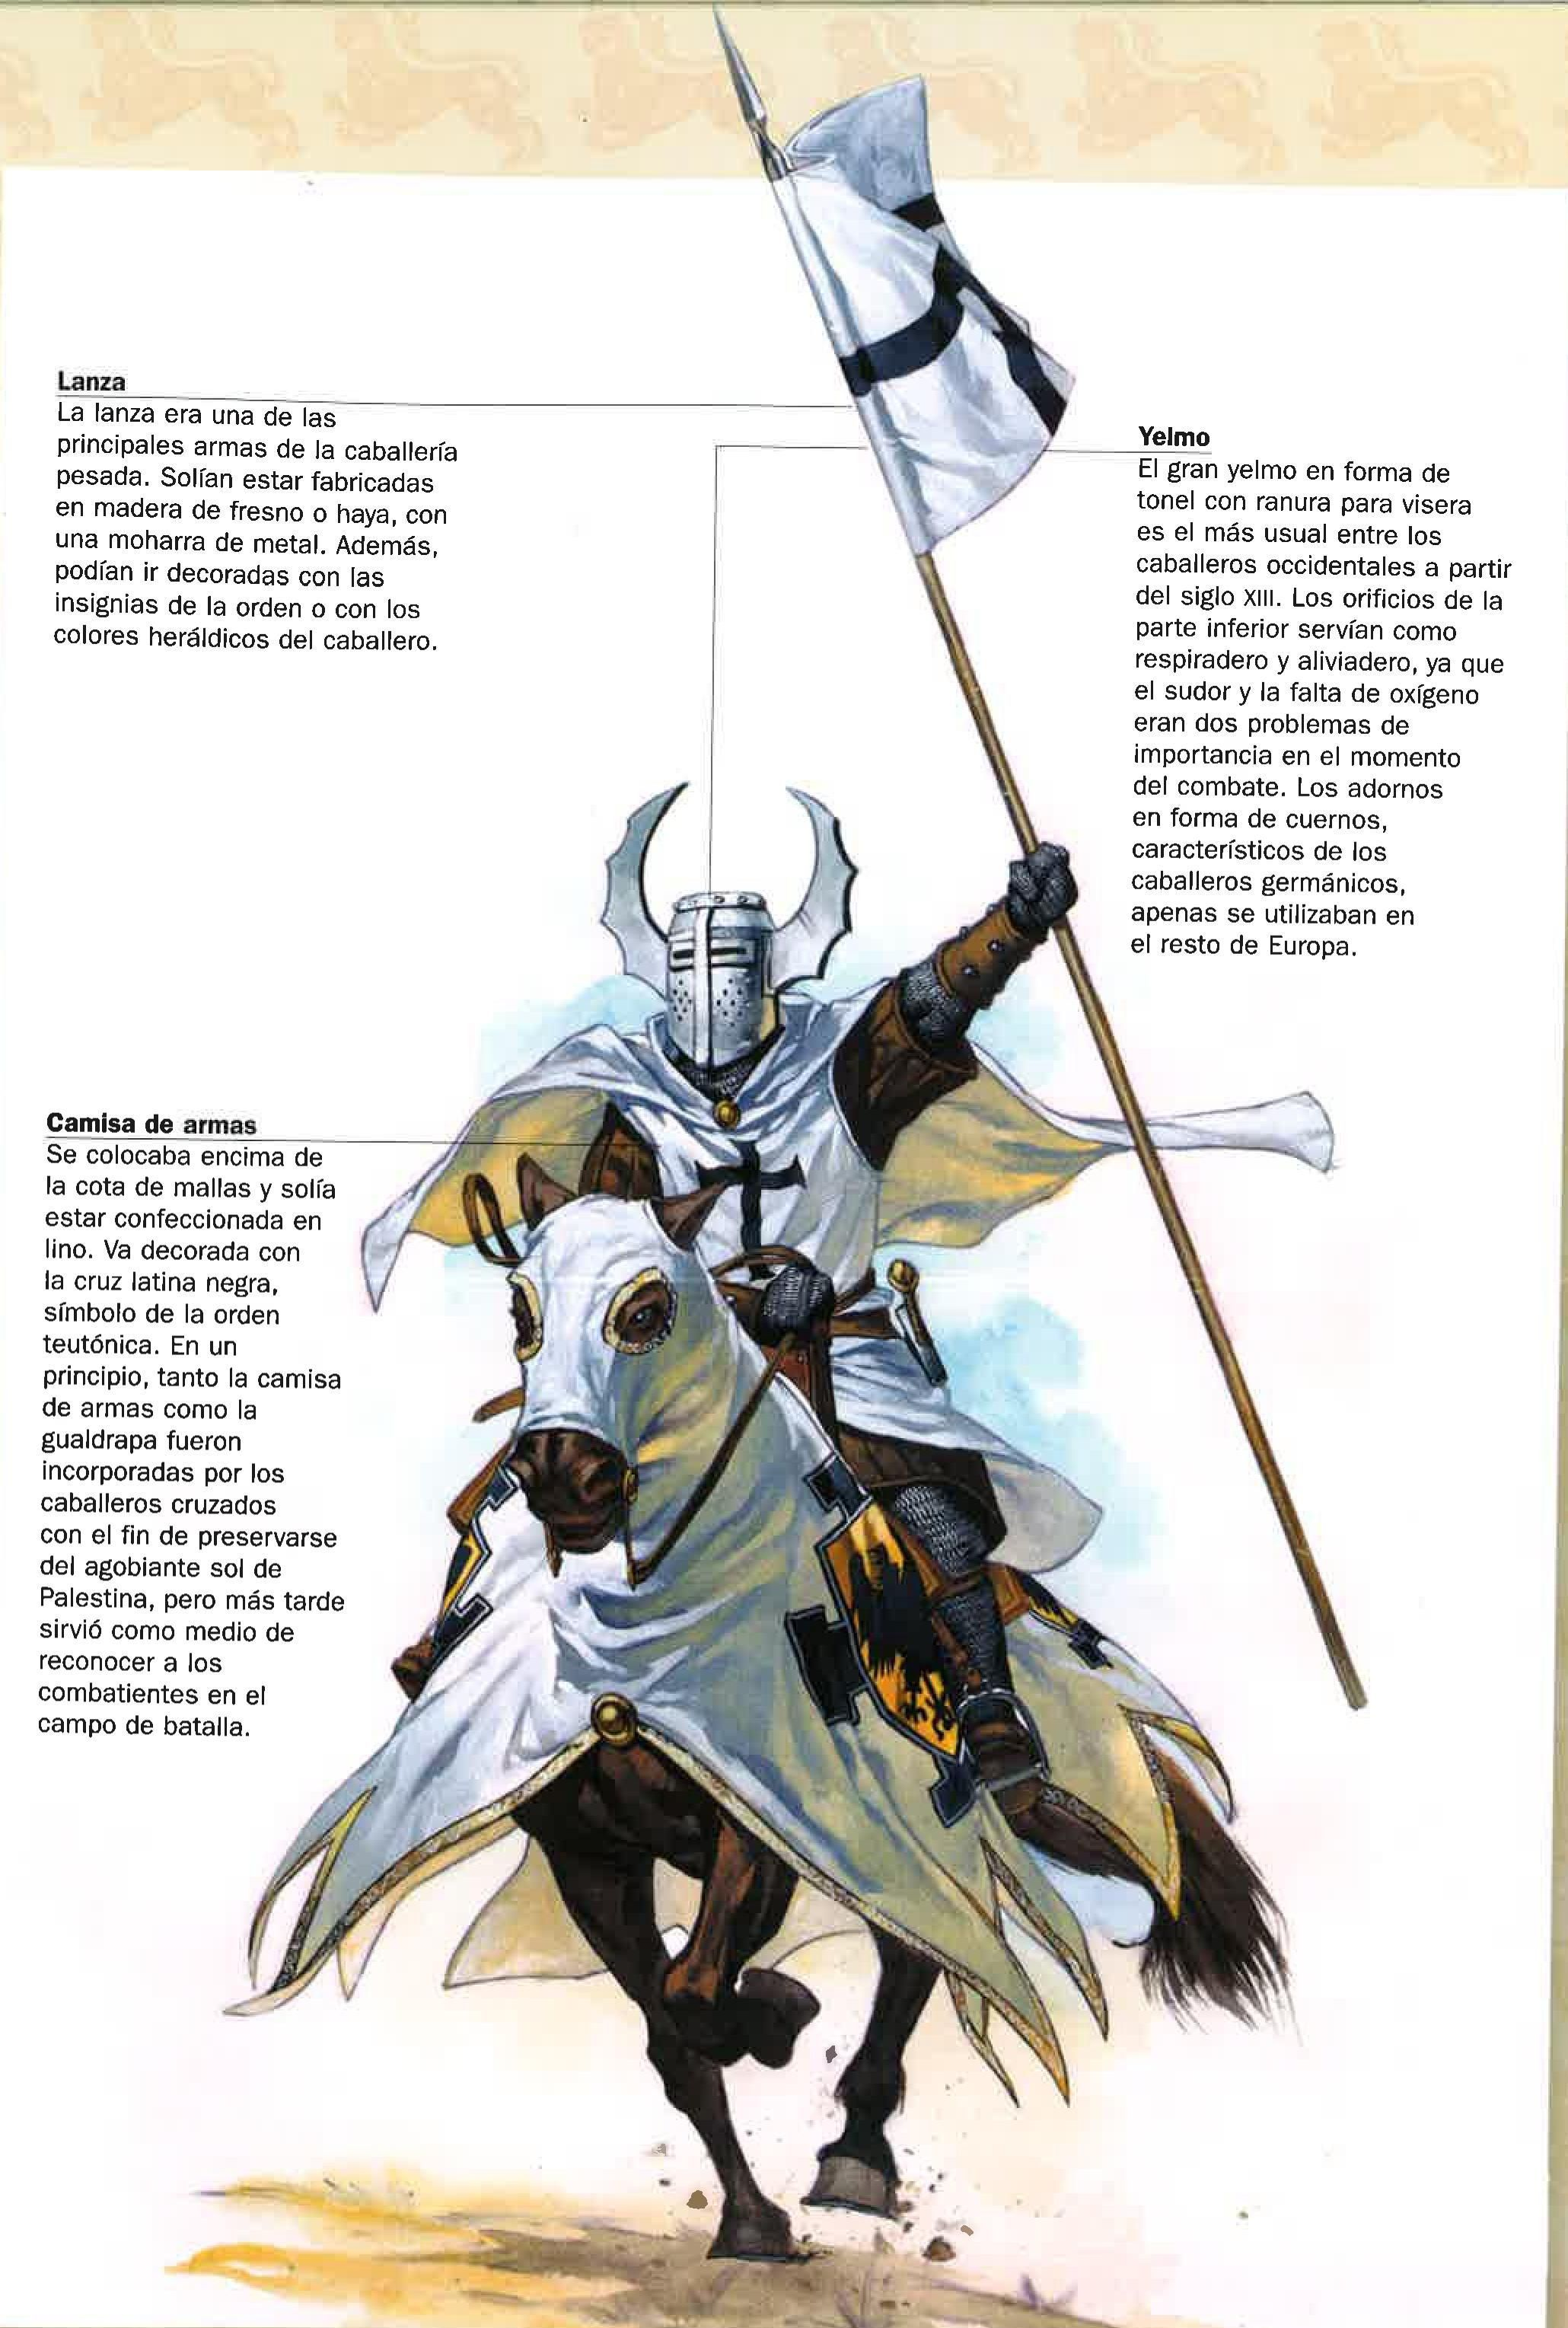 Teutonic crusader